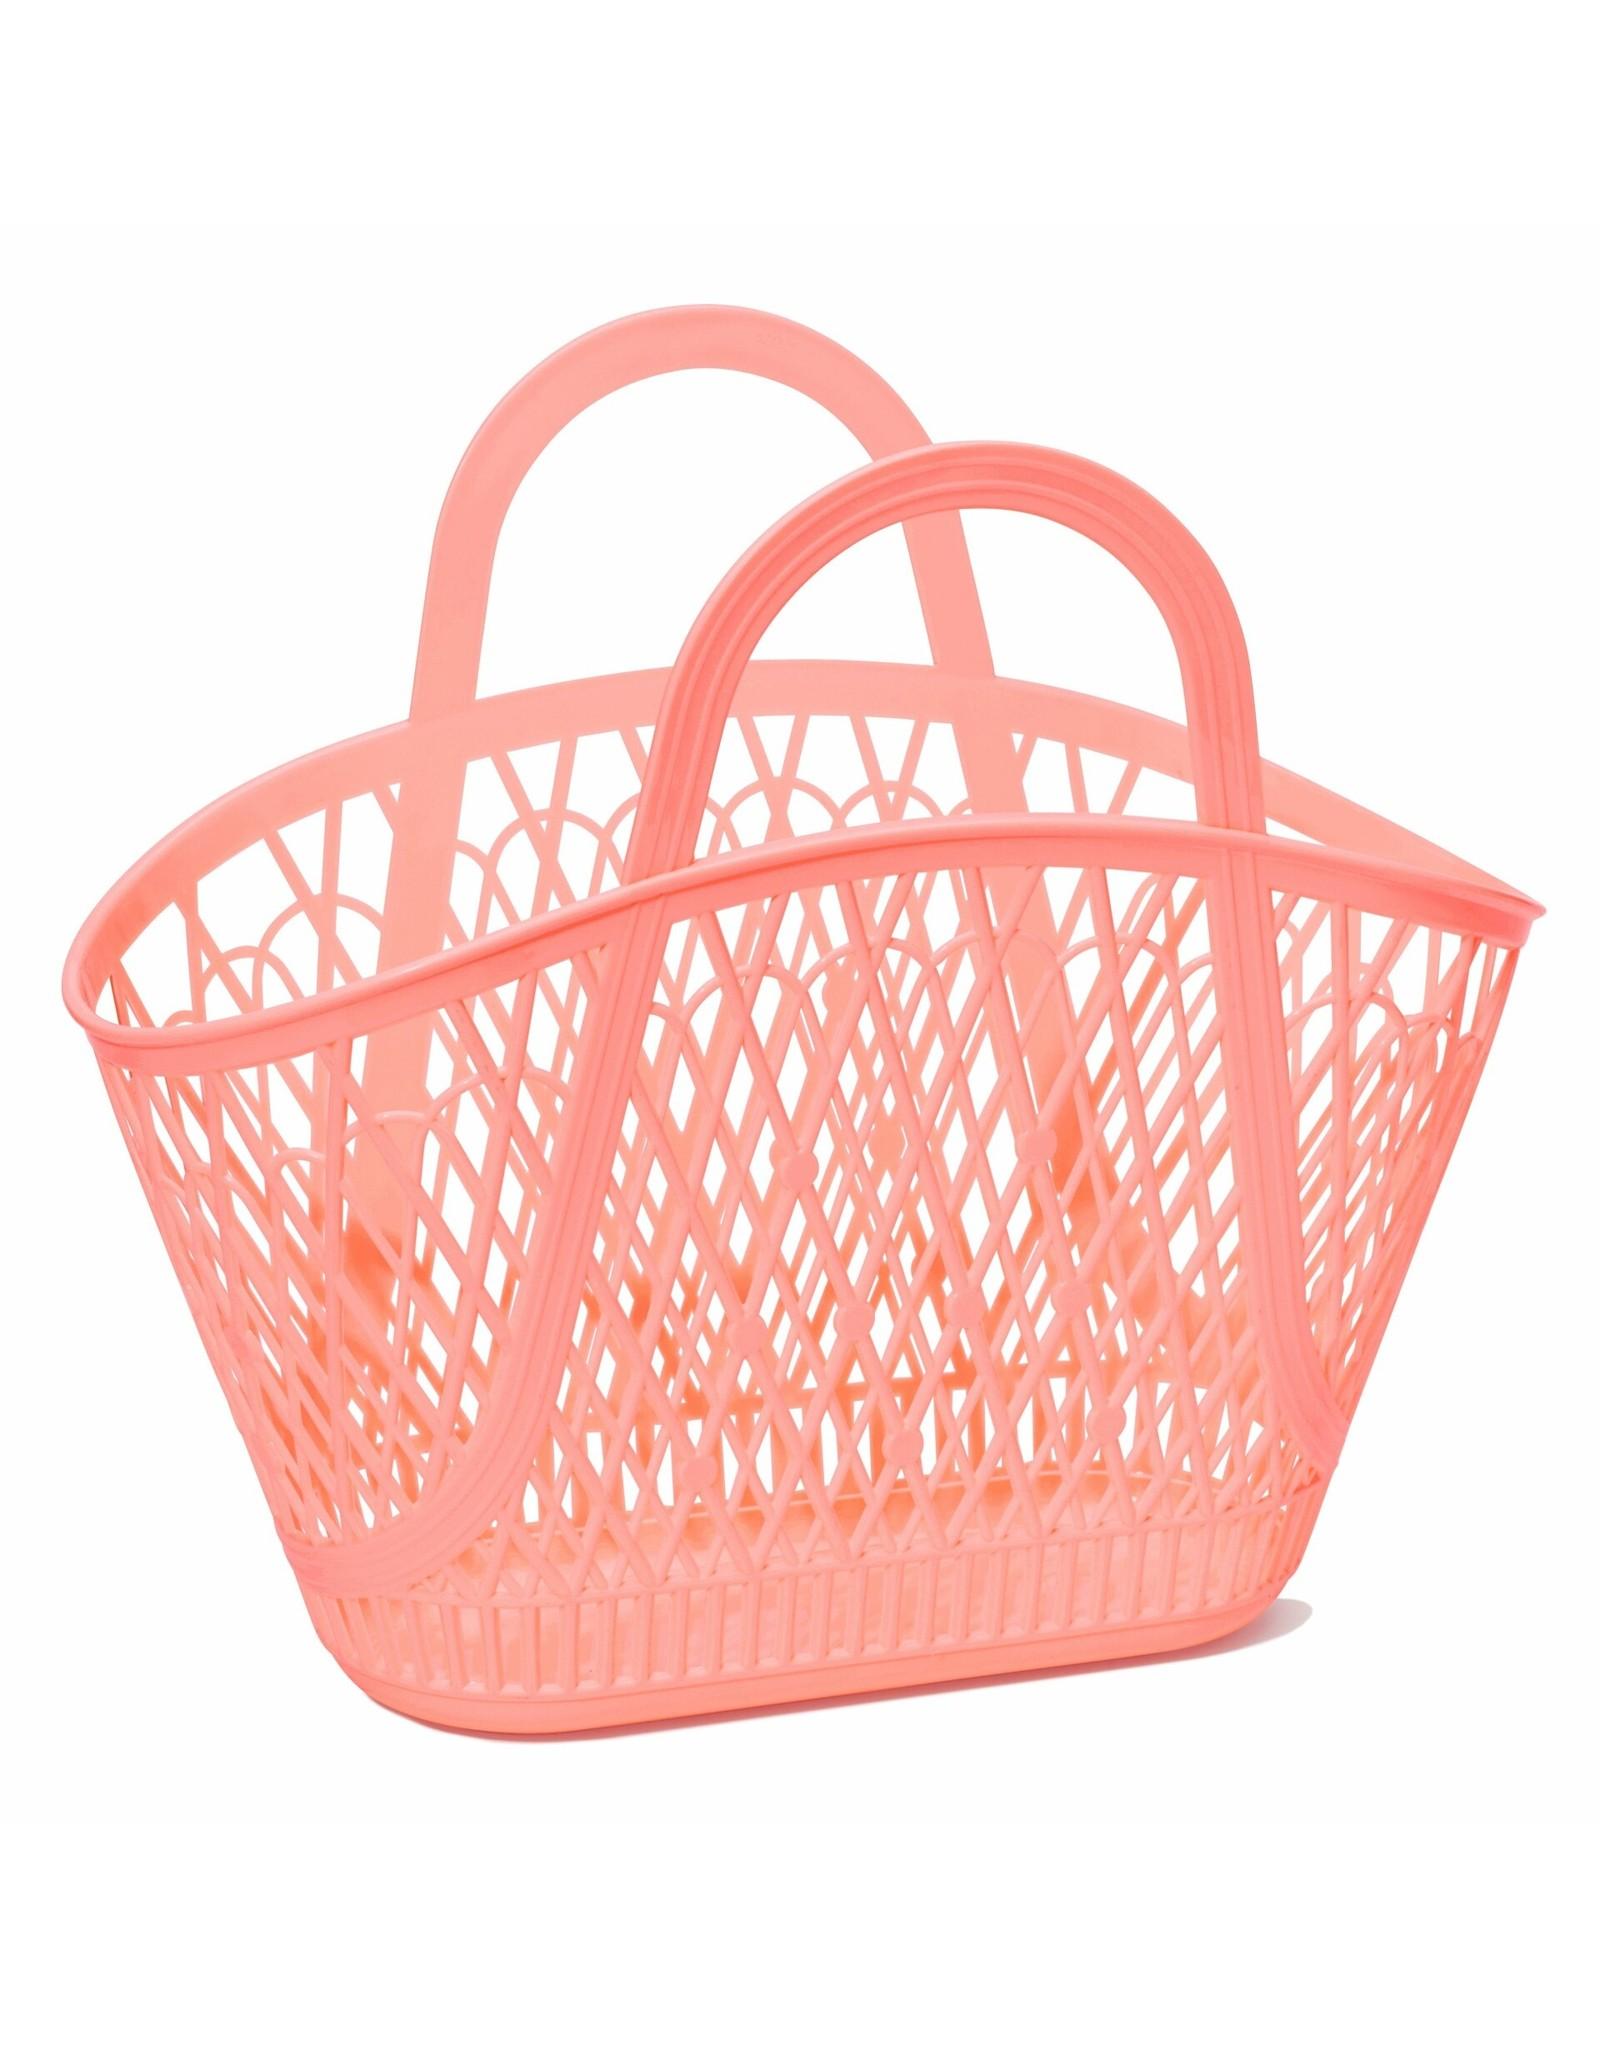 Sunjellies Sunjellies Betty Basket - Peach